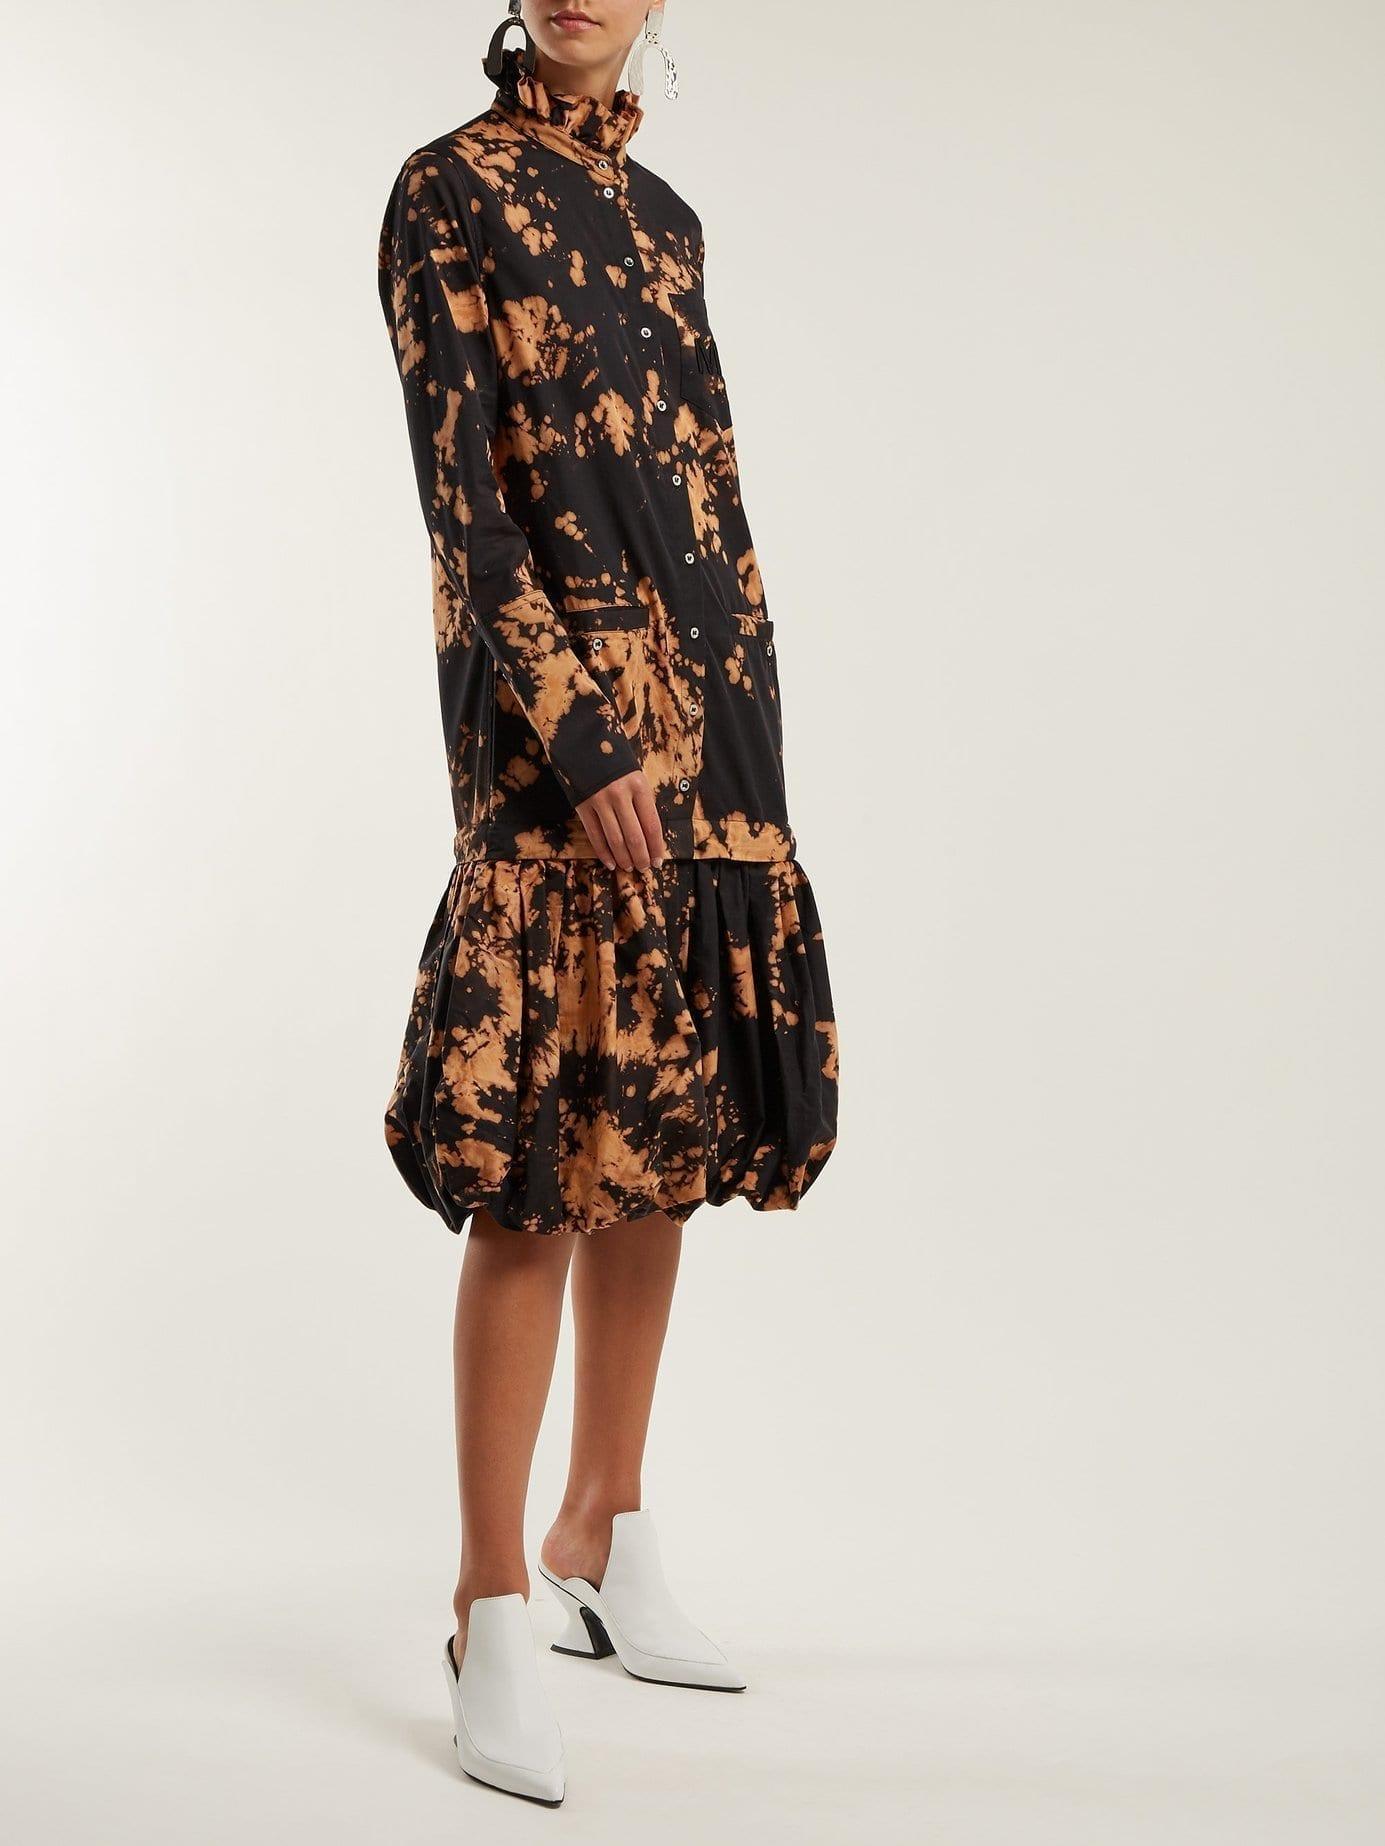 MARQUES'ALMEIDA Tie Dye Puff Hem Cotton Shirt Black Dress